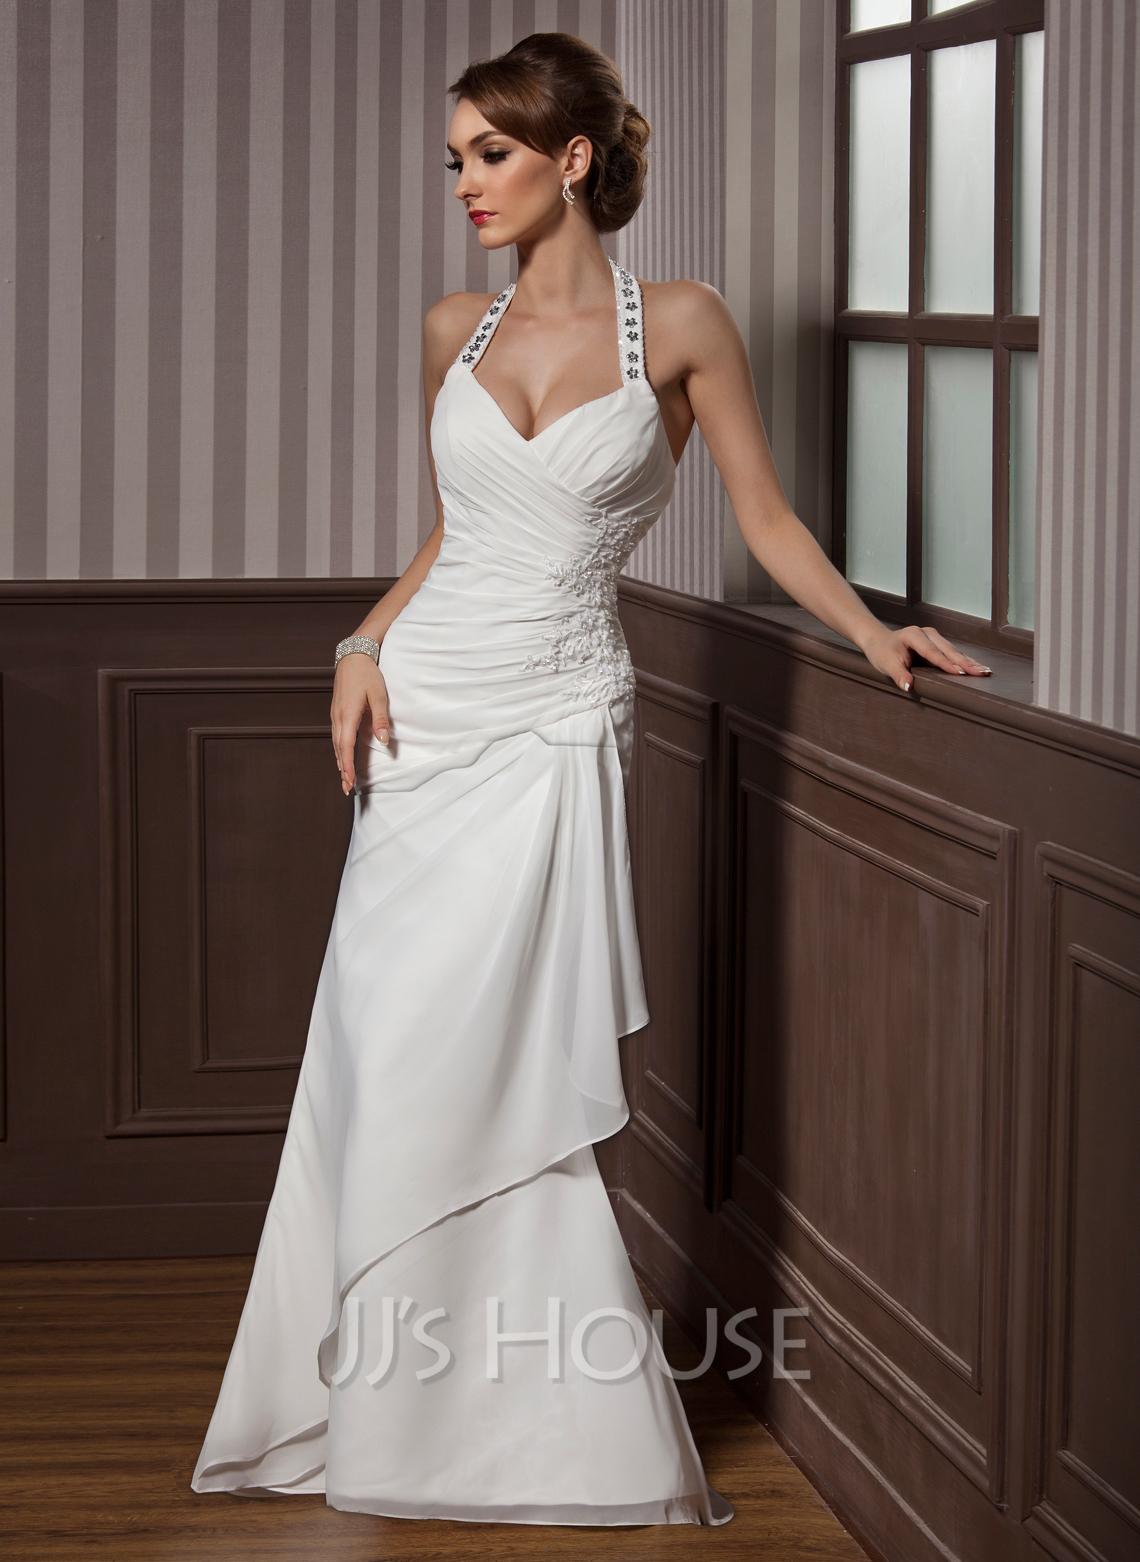 Sheath/Column Halter Floor-Length Chiffon Satin Wedding Dress With Ruffle Beading Appliques Lace Sequins